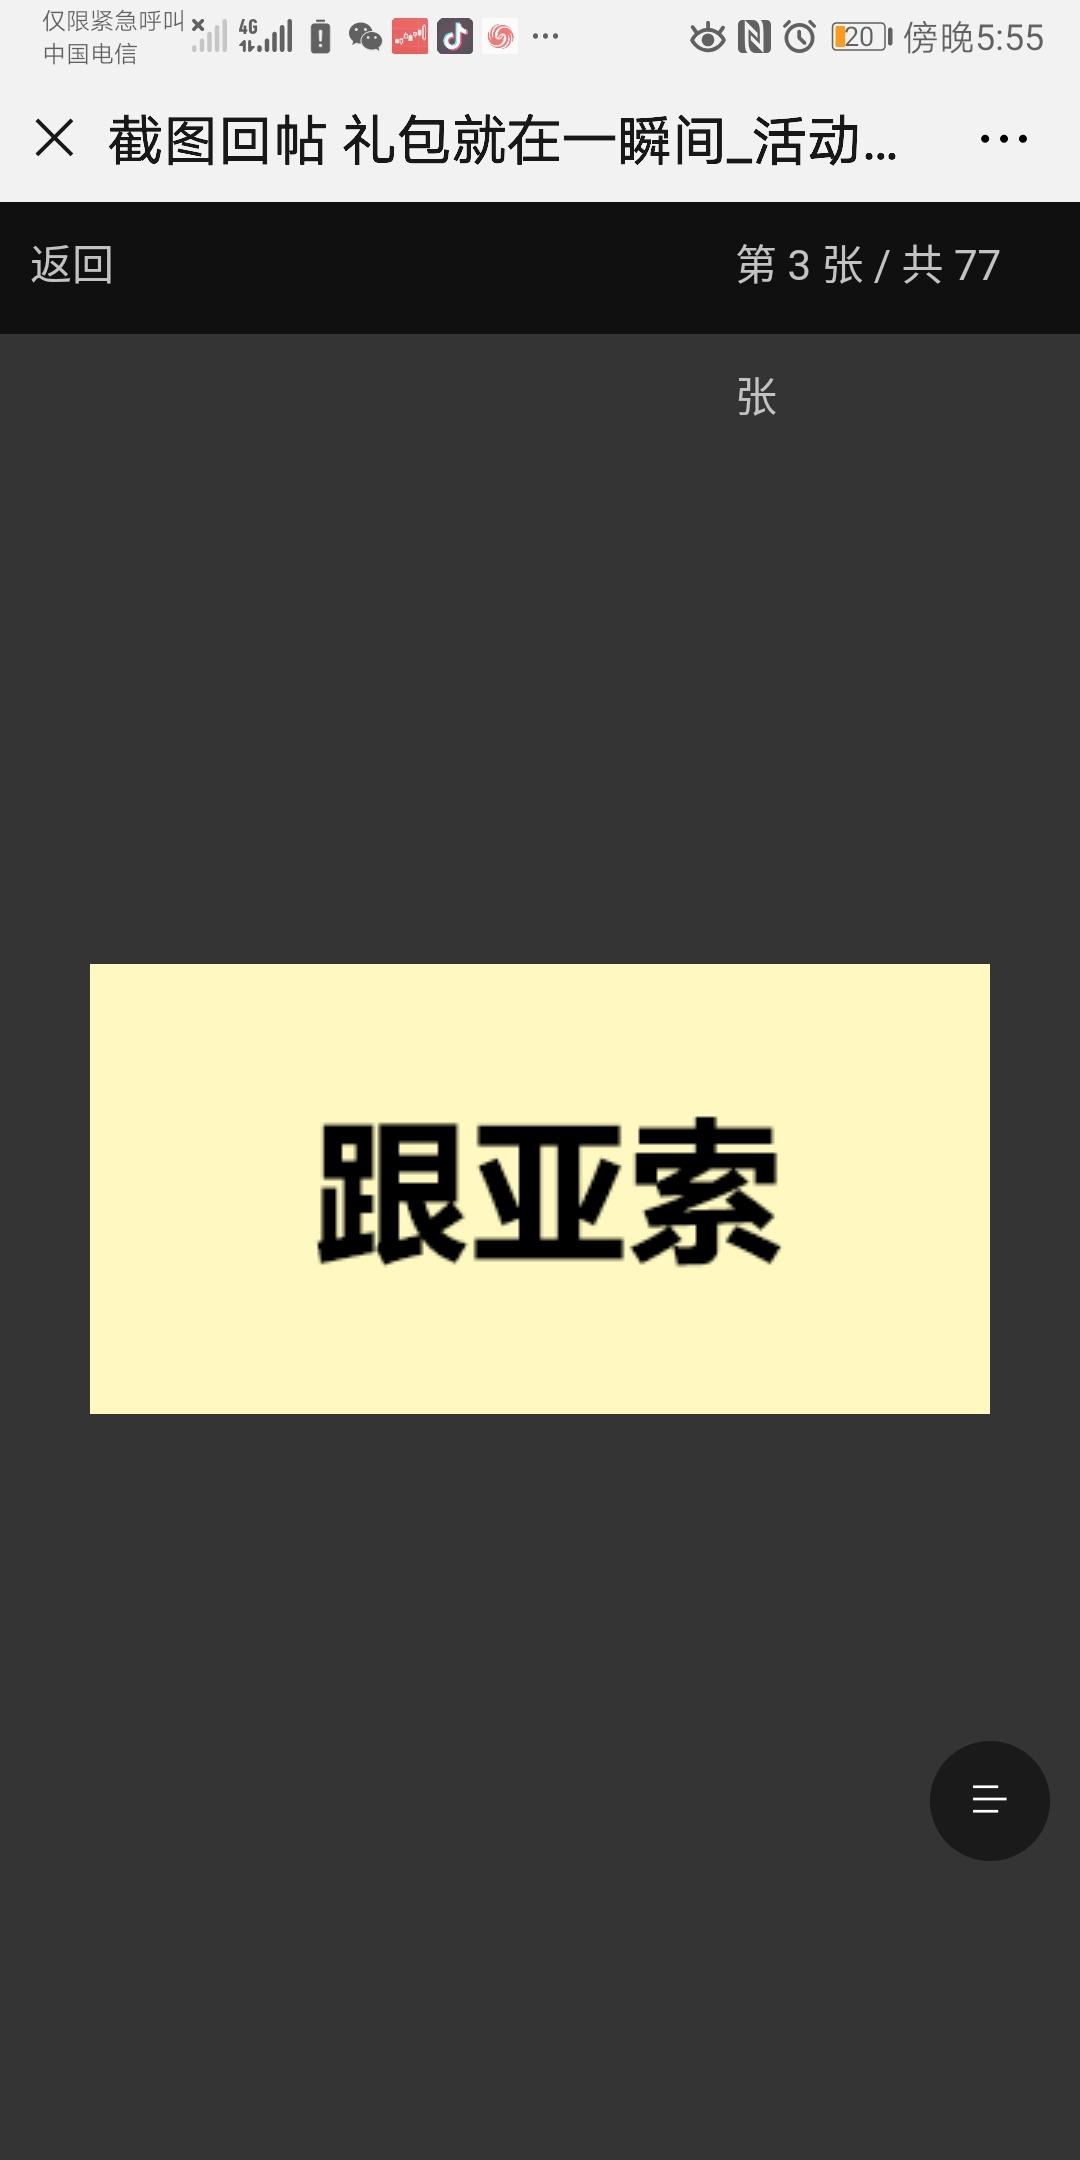 Screenshot_20190725_175525_com.tencent.mm.jpg